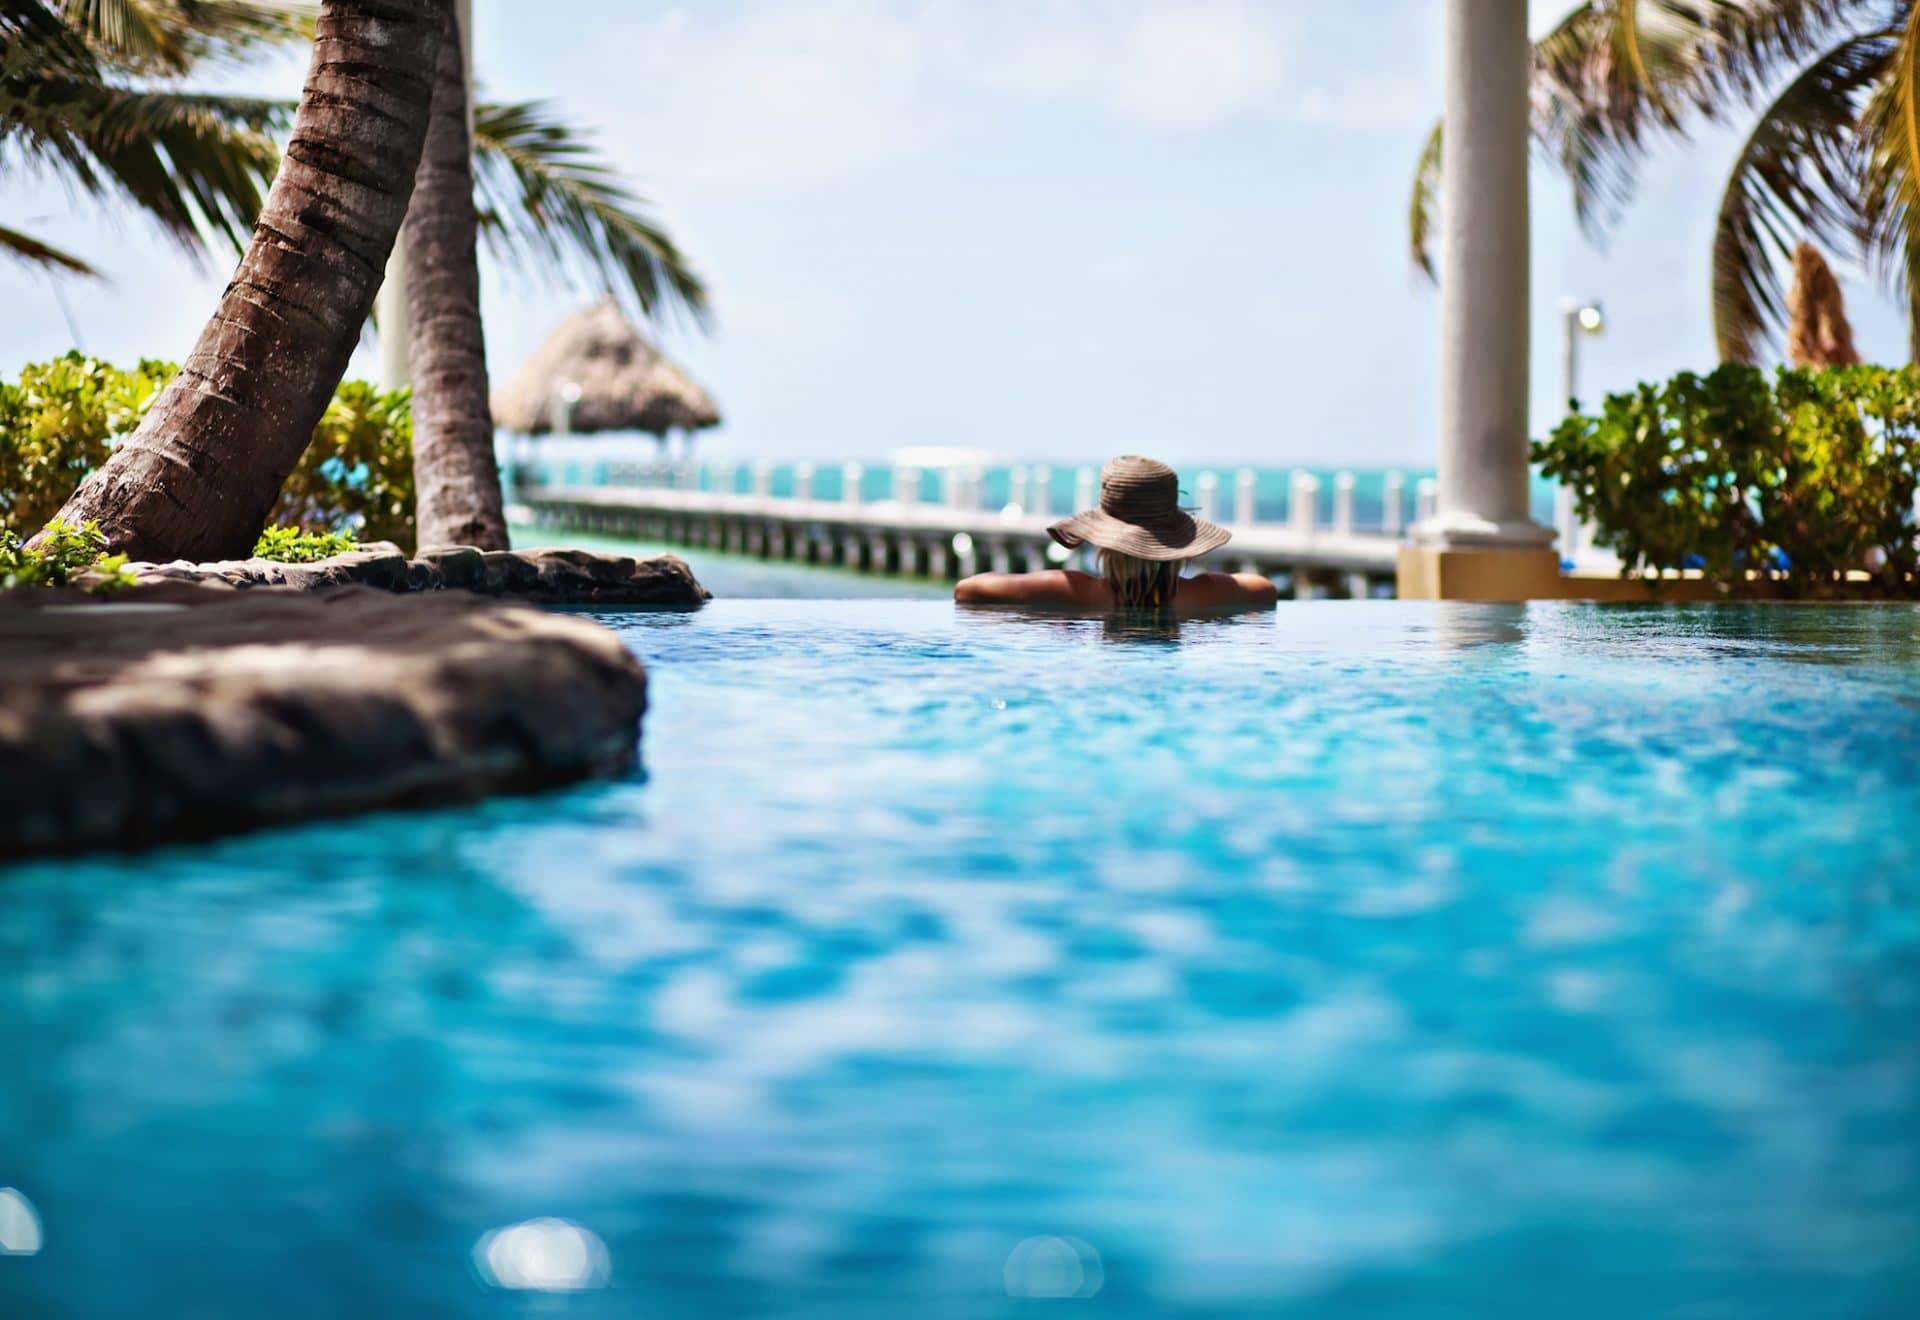 Ambergris Caye Luxury Resort  Accommodations  Island